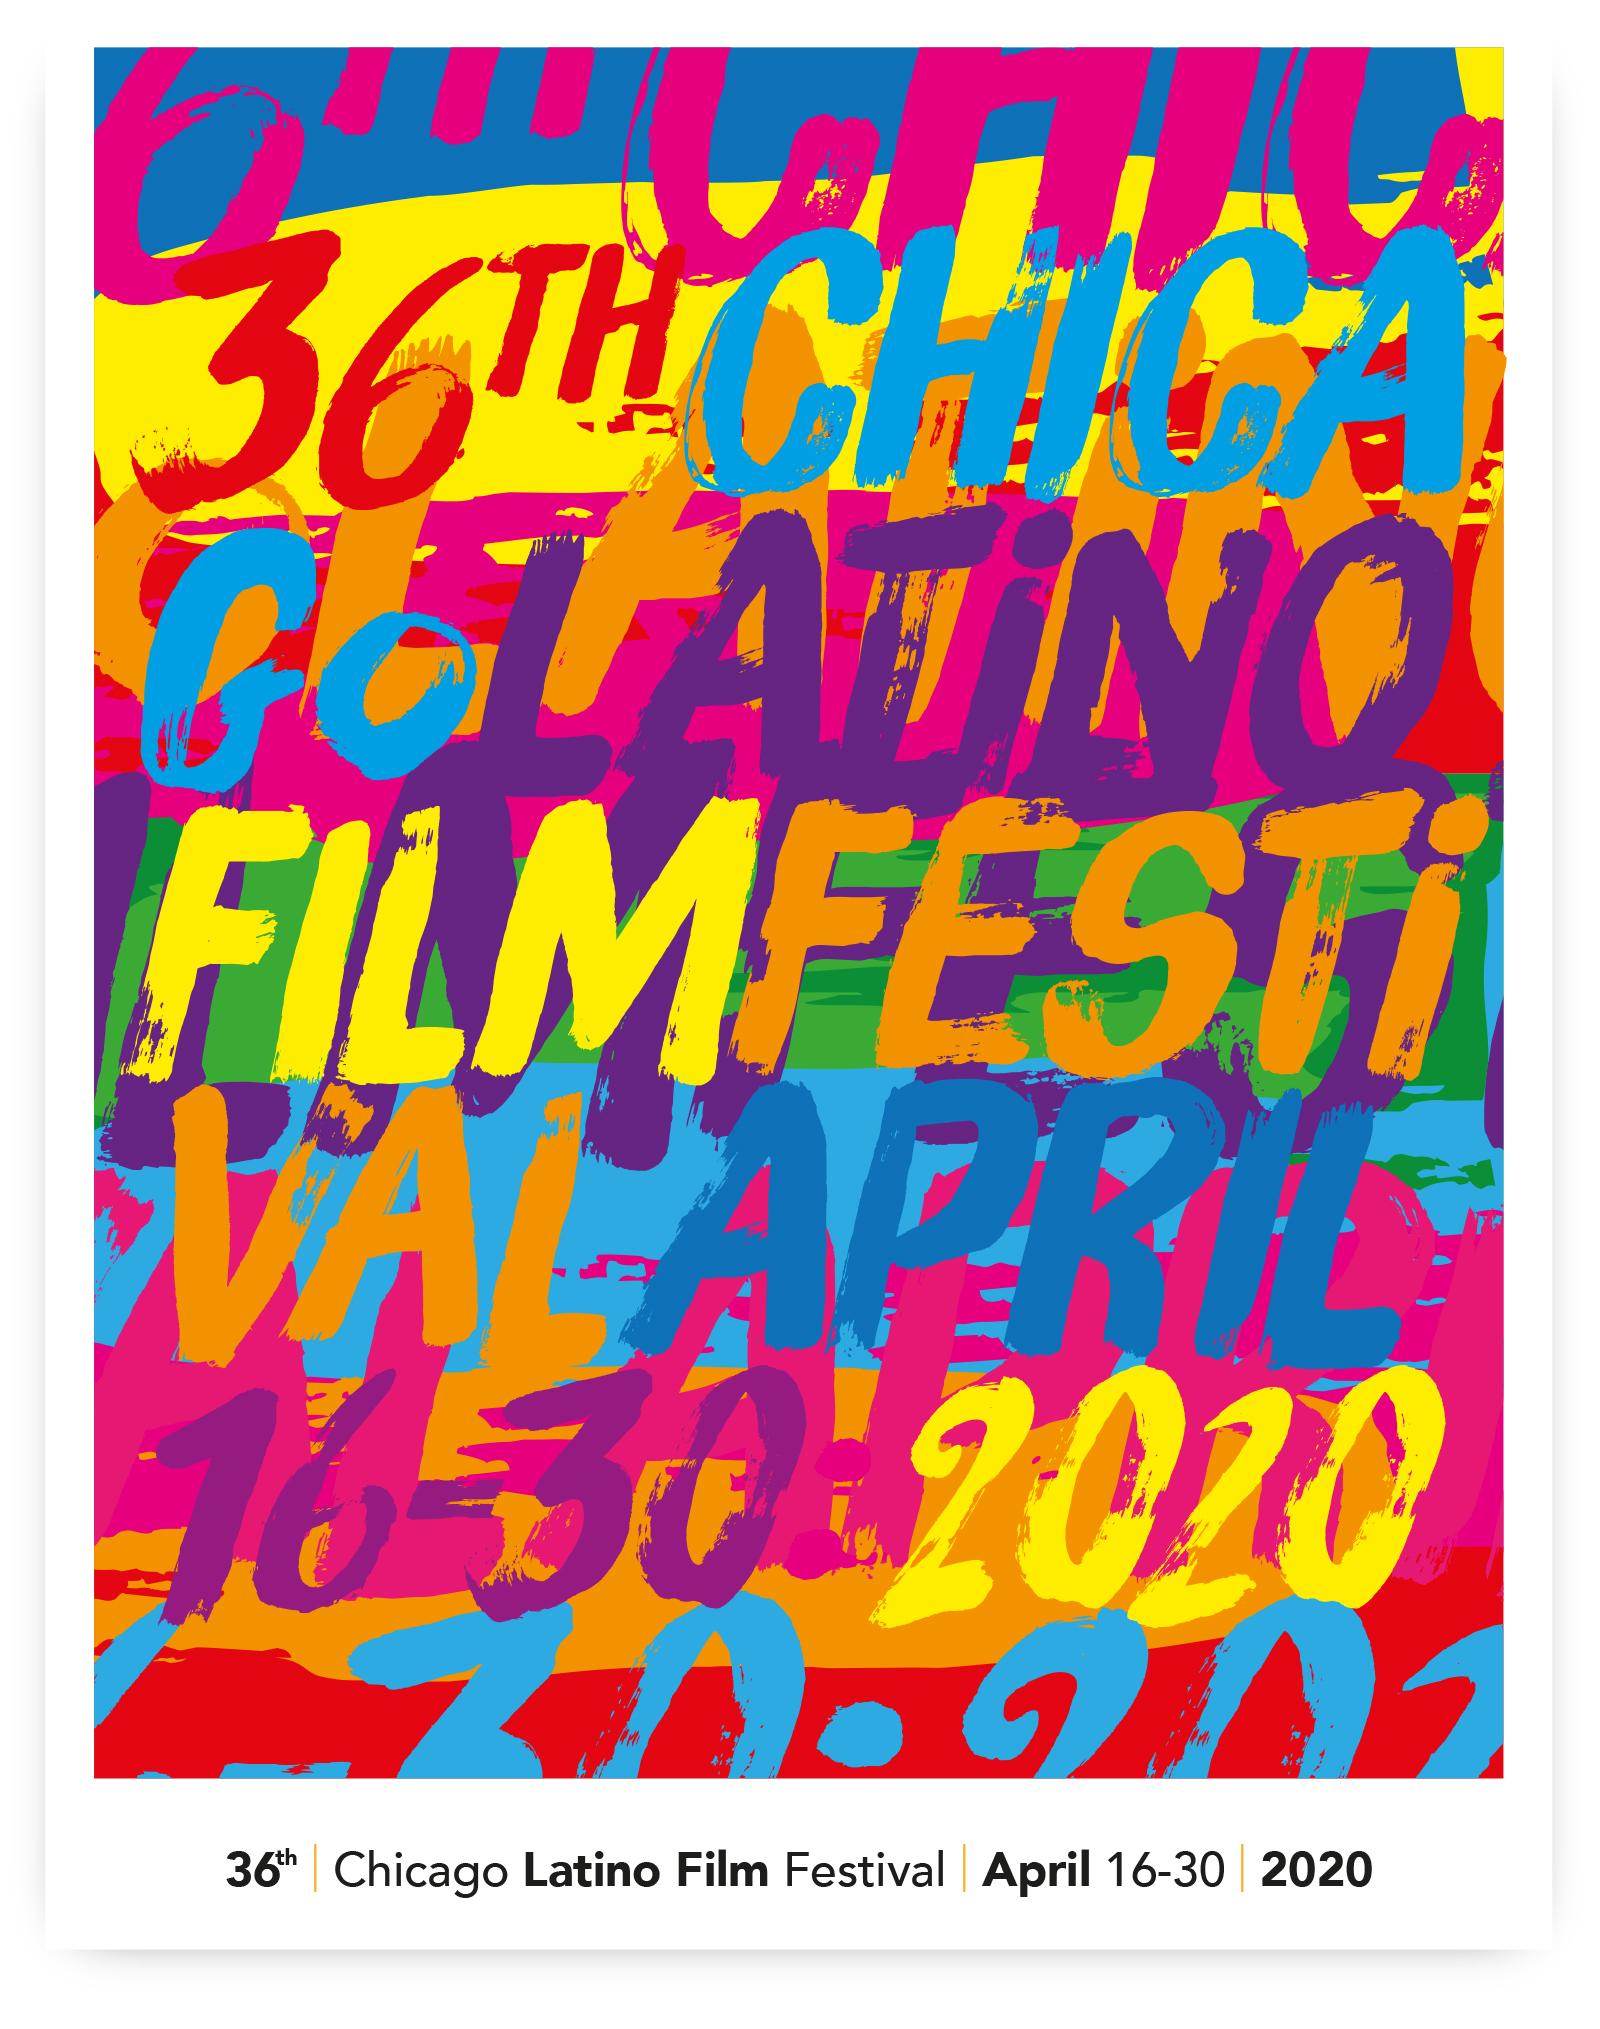 Pedro Cabañas - Design - 36th CHICAGO LATINO FILM FESTIVAL